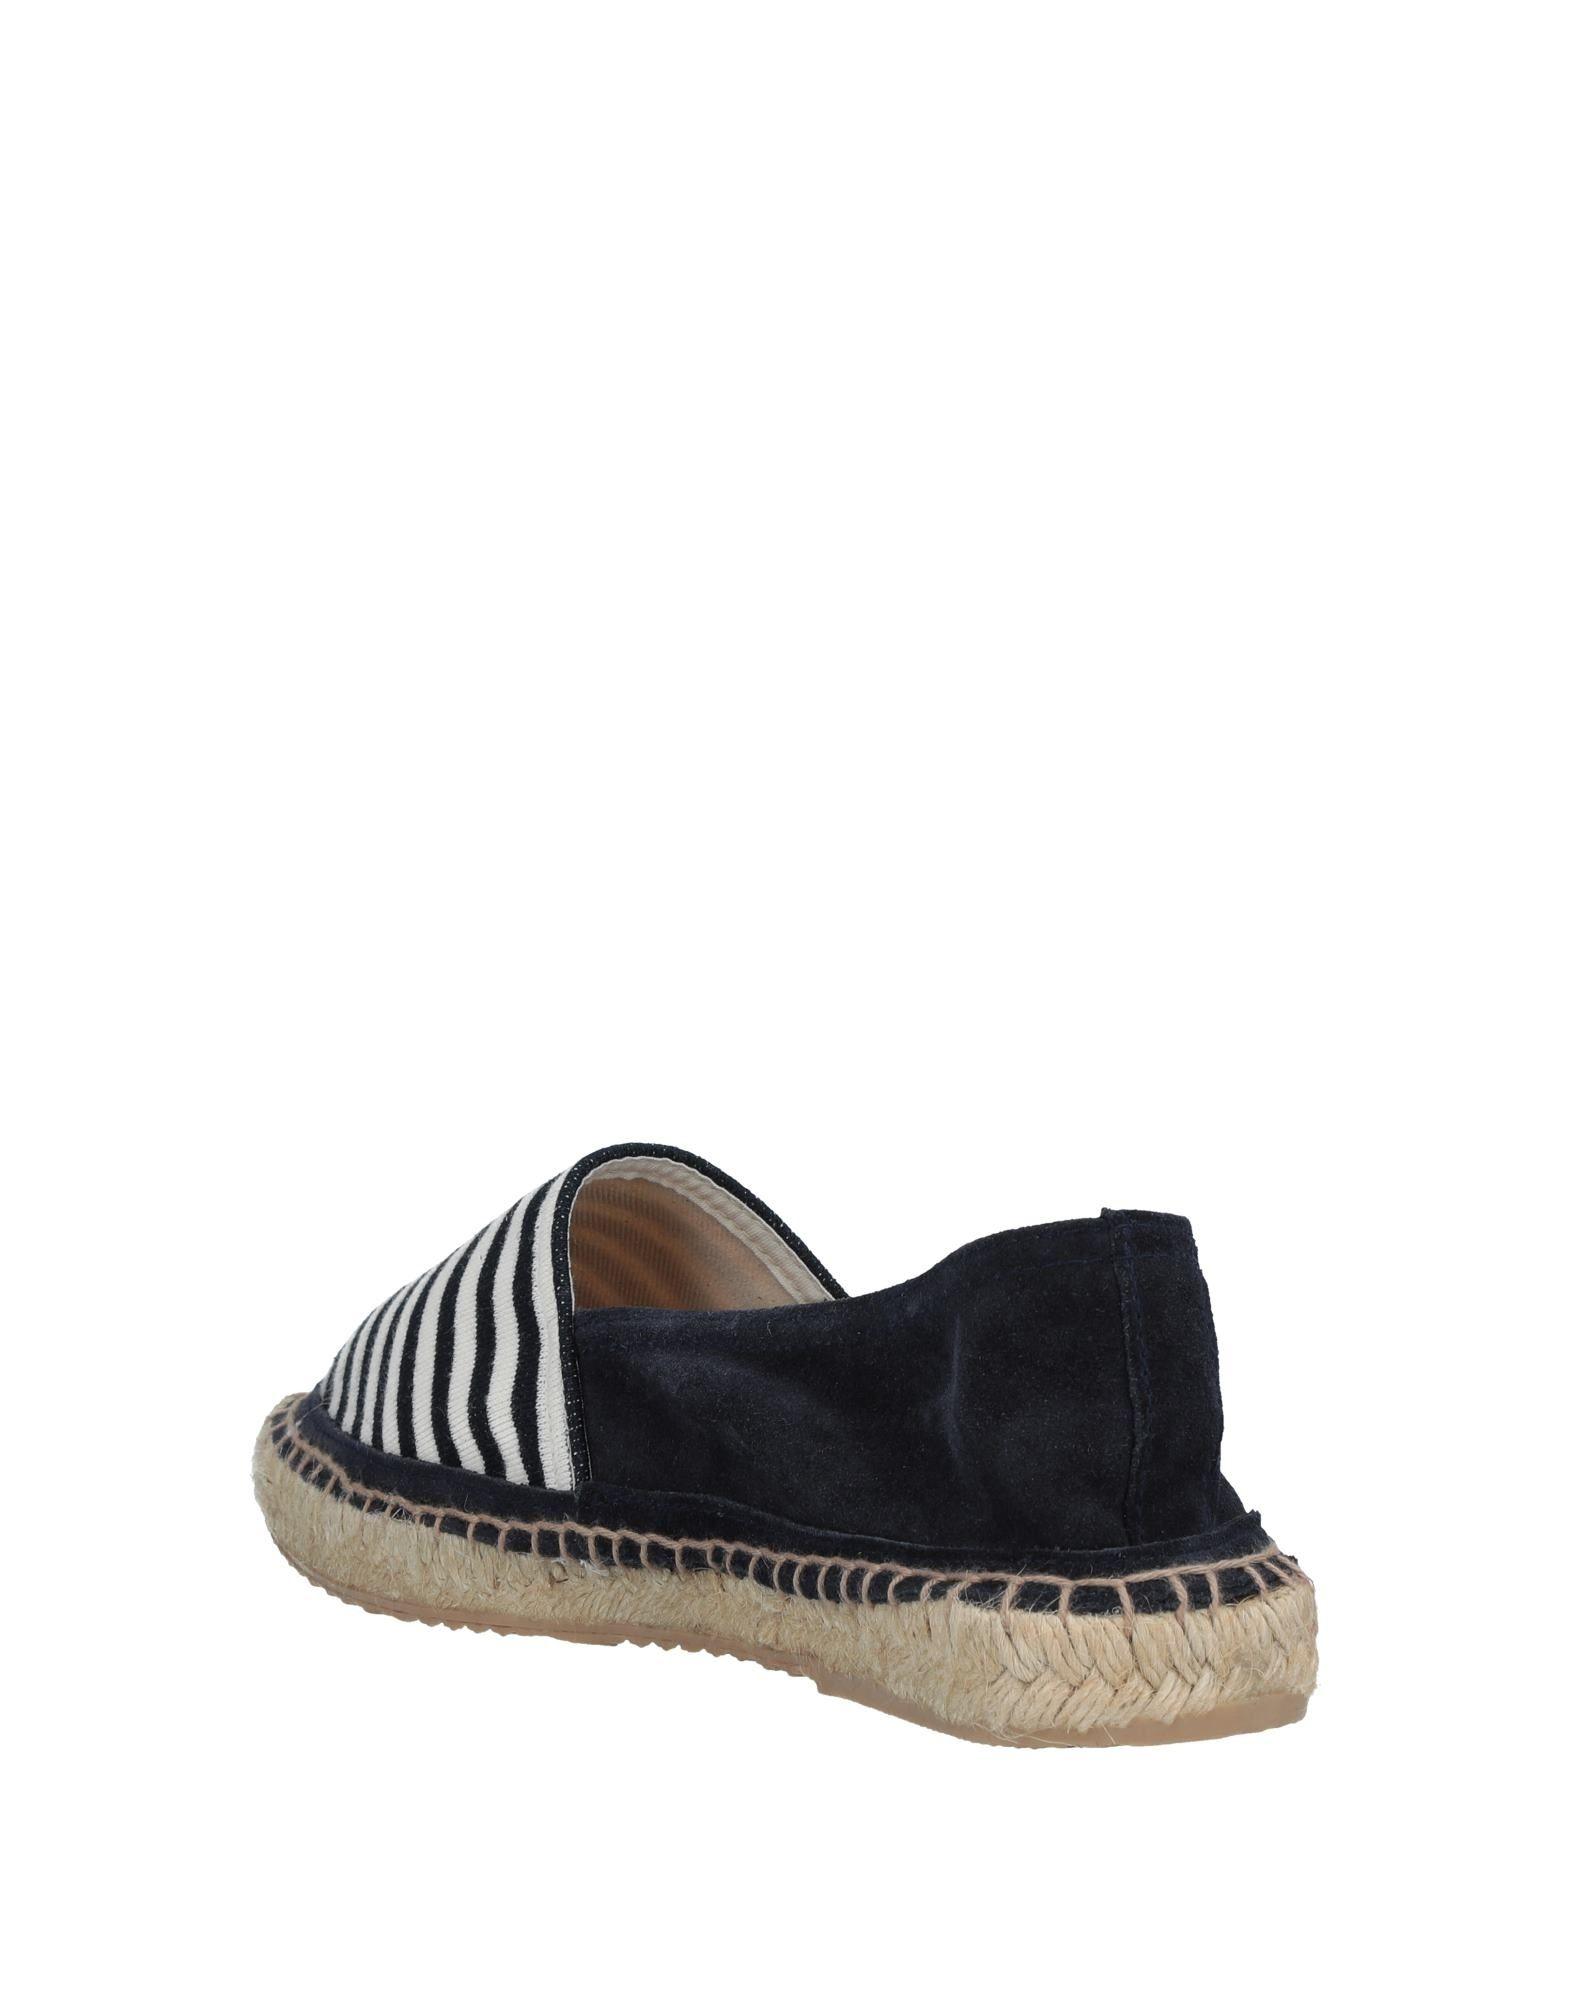 Daniele 11101552AK Alessandrini Espadrilles Herren  11101552AK Daniele Gute Qualität beliebte Schuhe 22f419